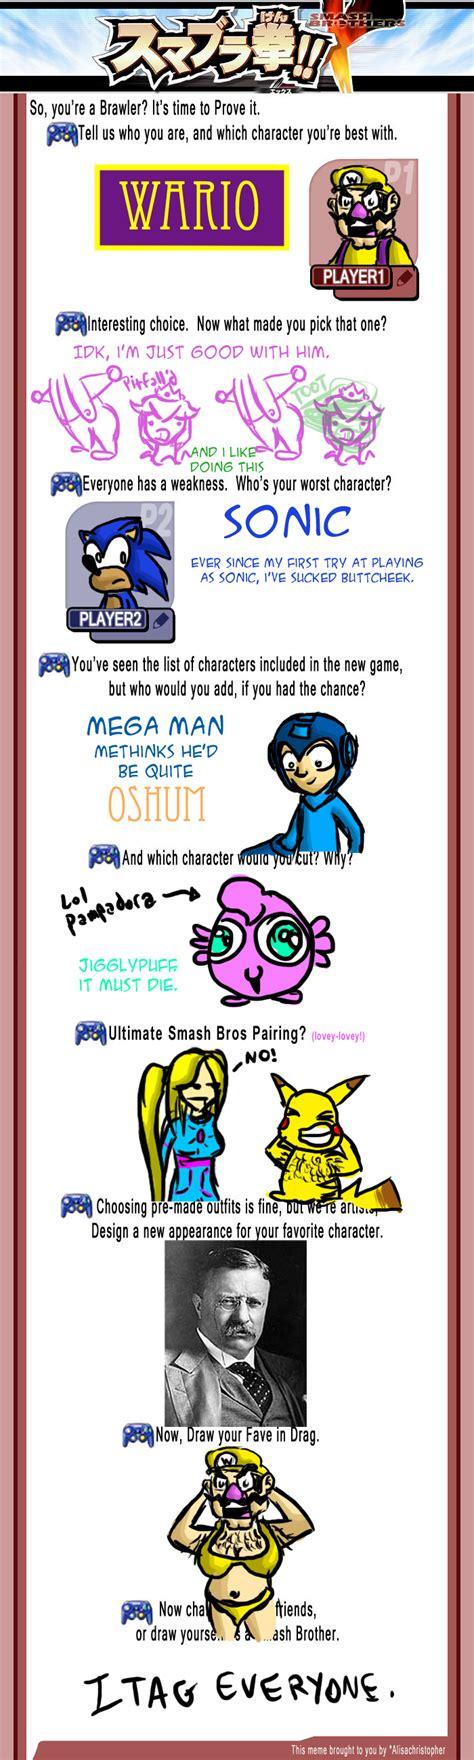 Super Smash Bros Meme - ssb memes related keywords ssb memes long tail keywords keywordsking